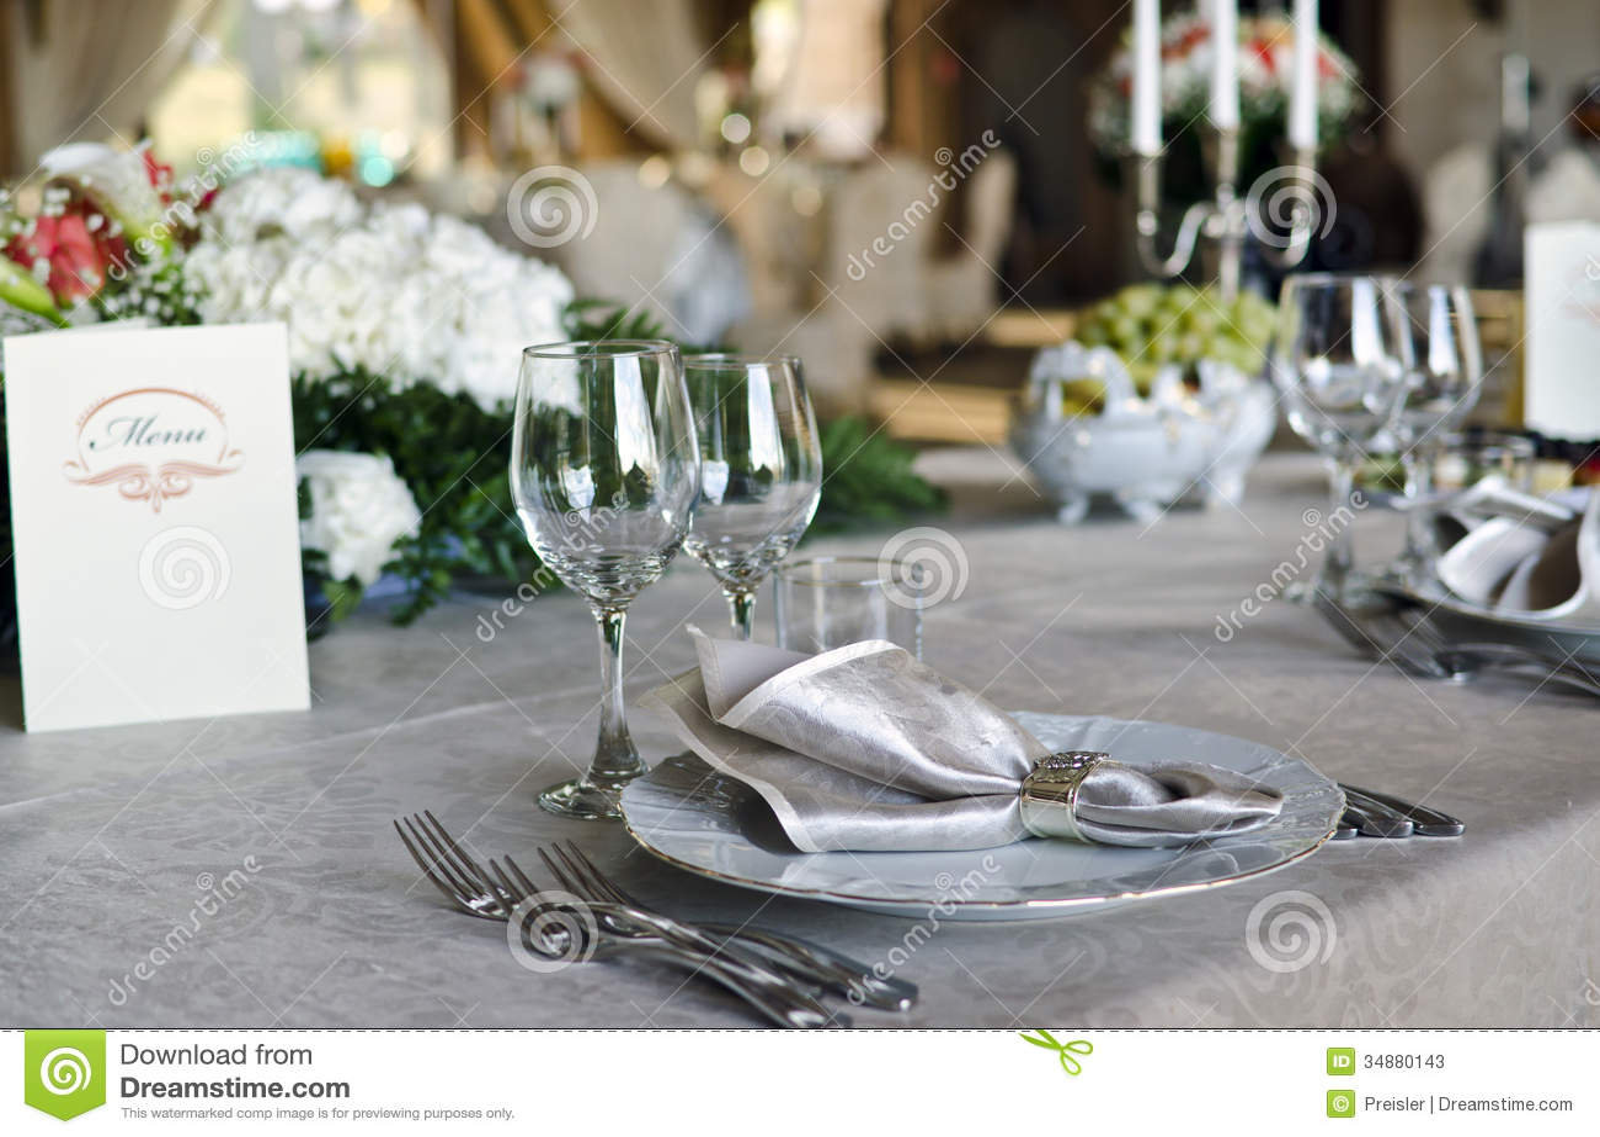 Elegant Table Setting Stock Image Image Of Dine Decor